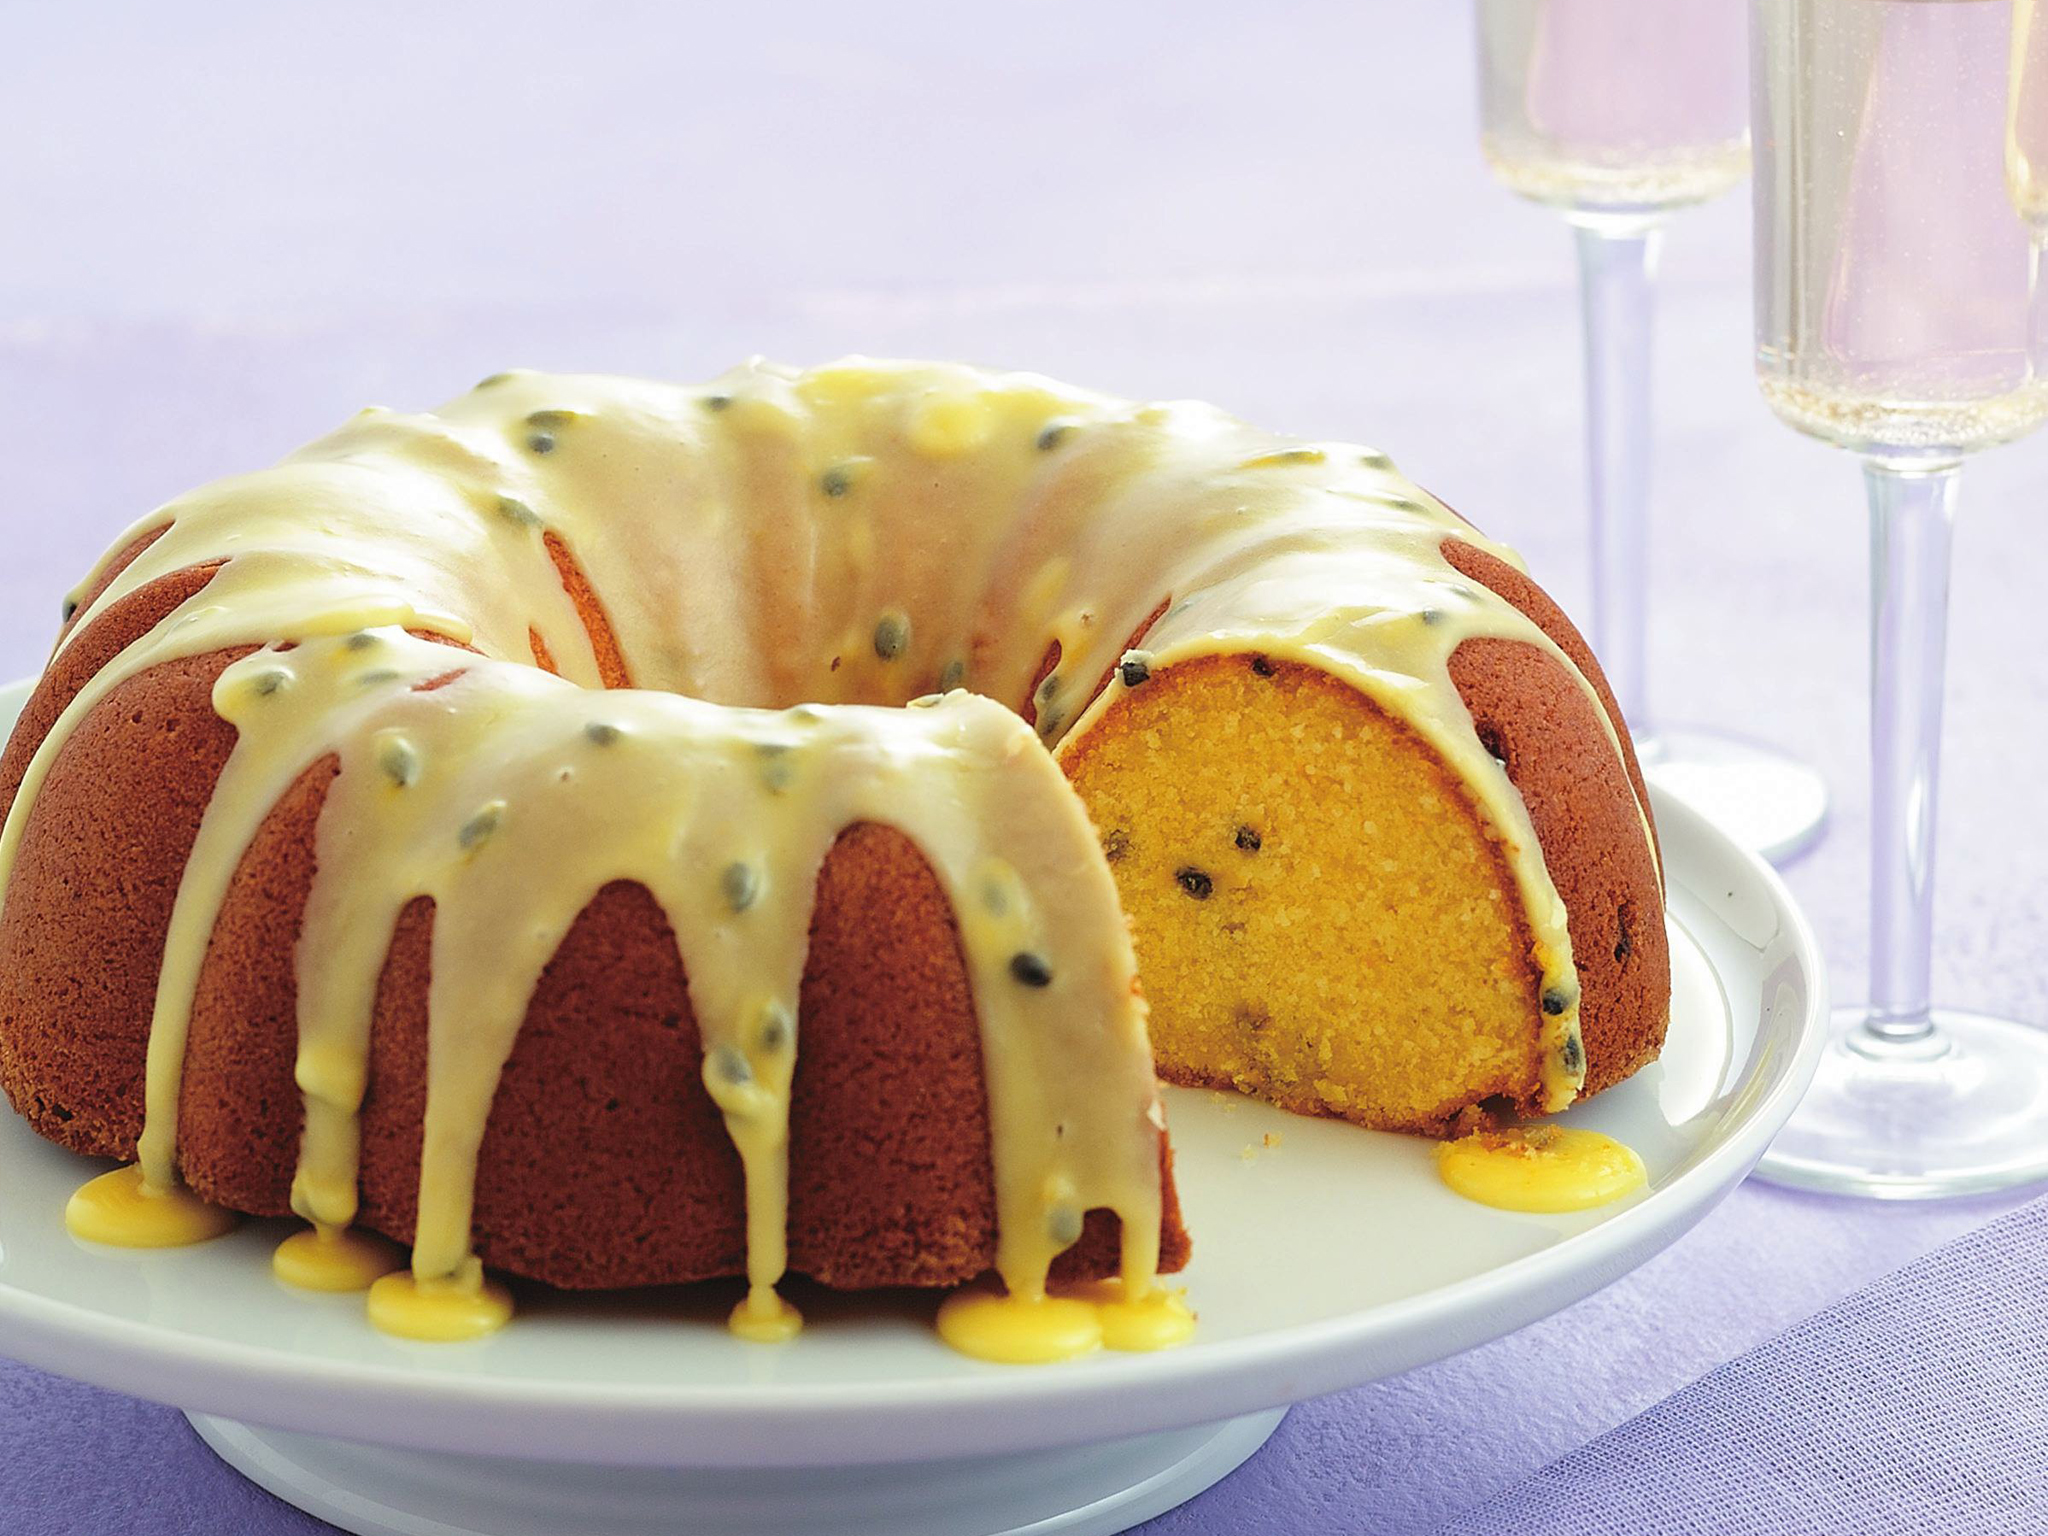 Buttermilk cake recipes australia